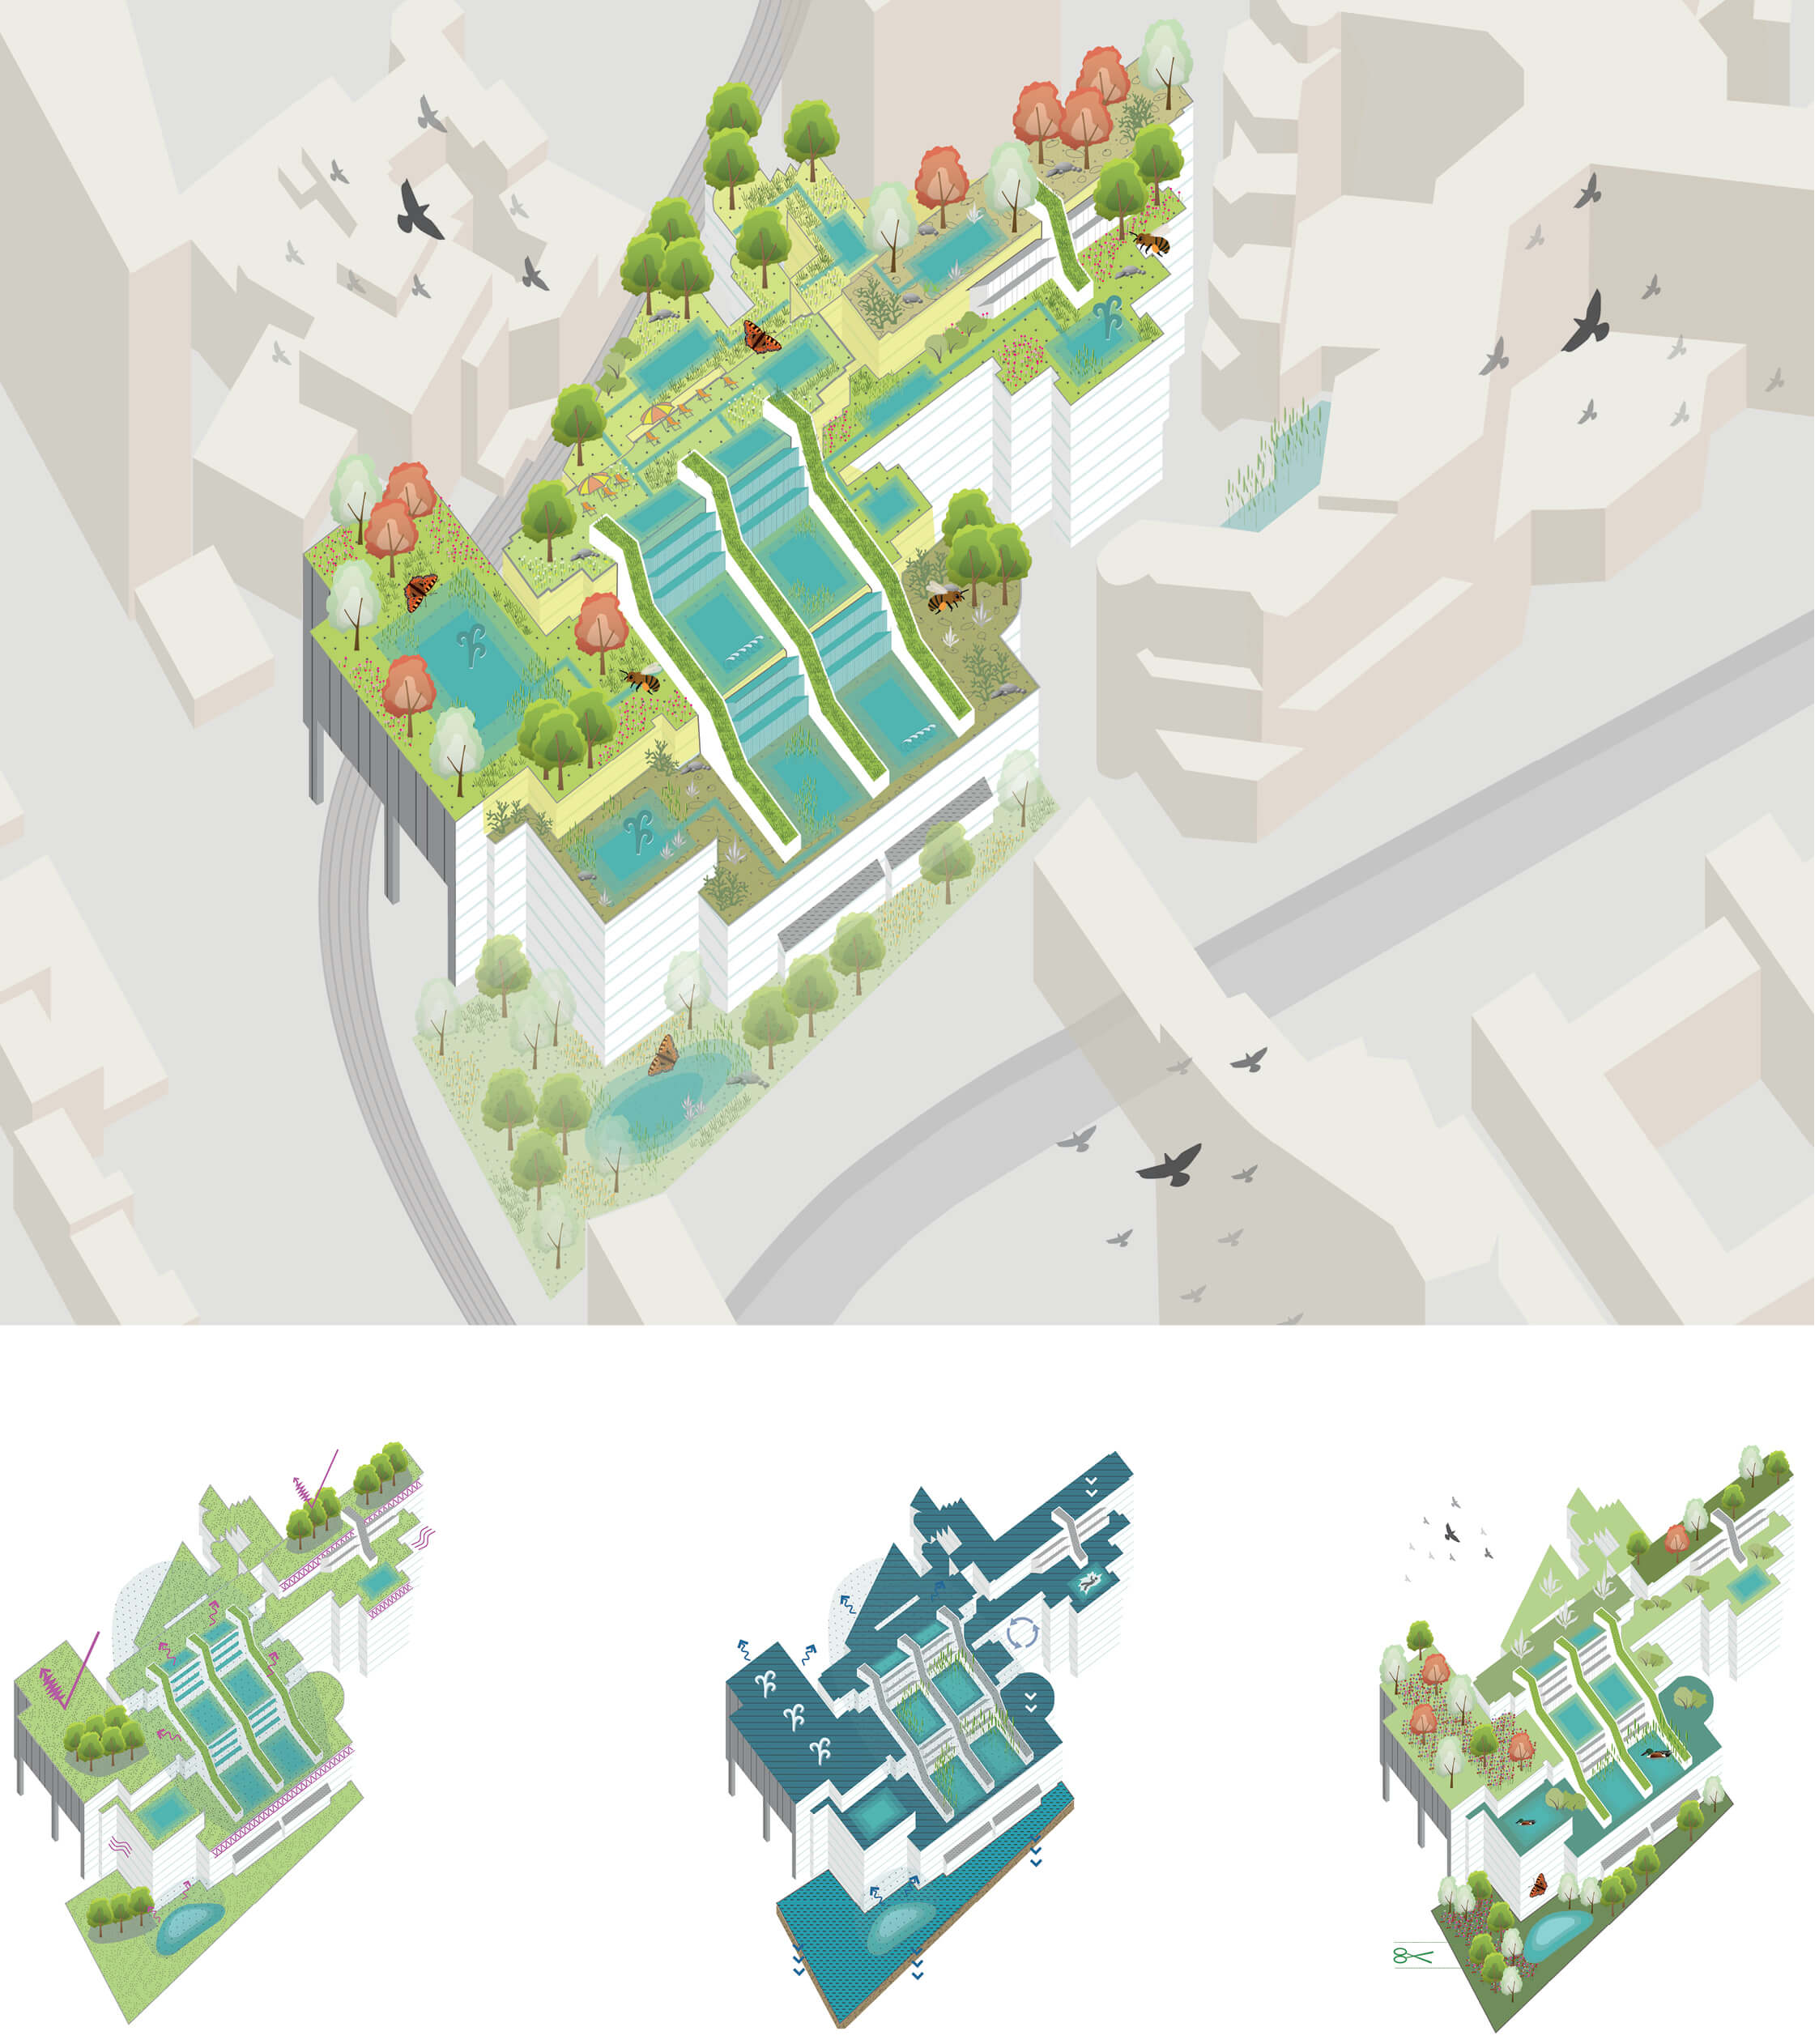 felixx-greenicons-conceptpool.jpg